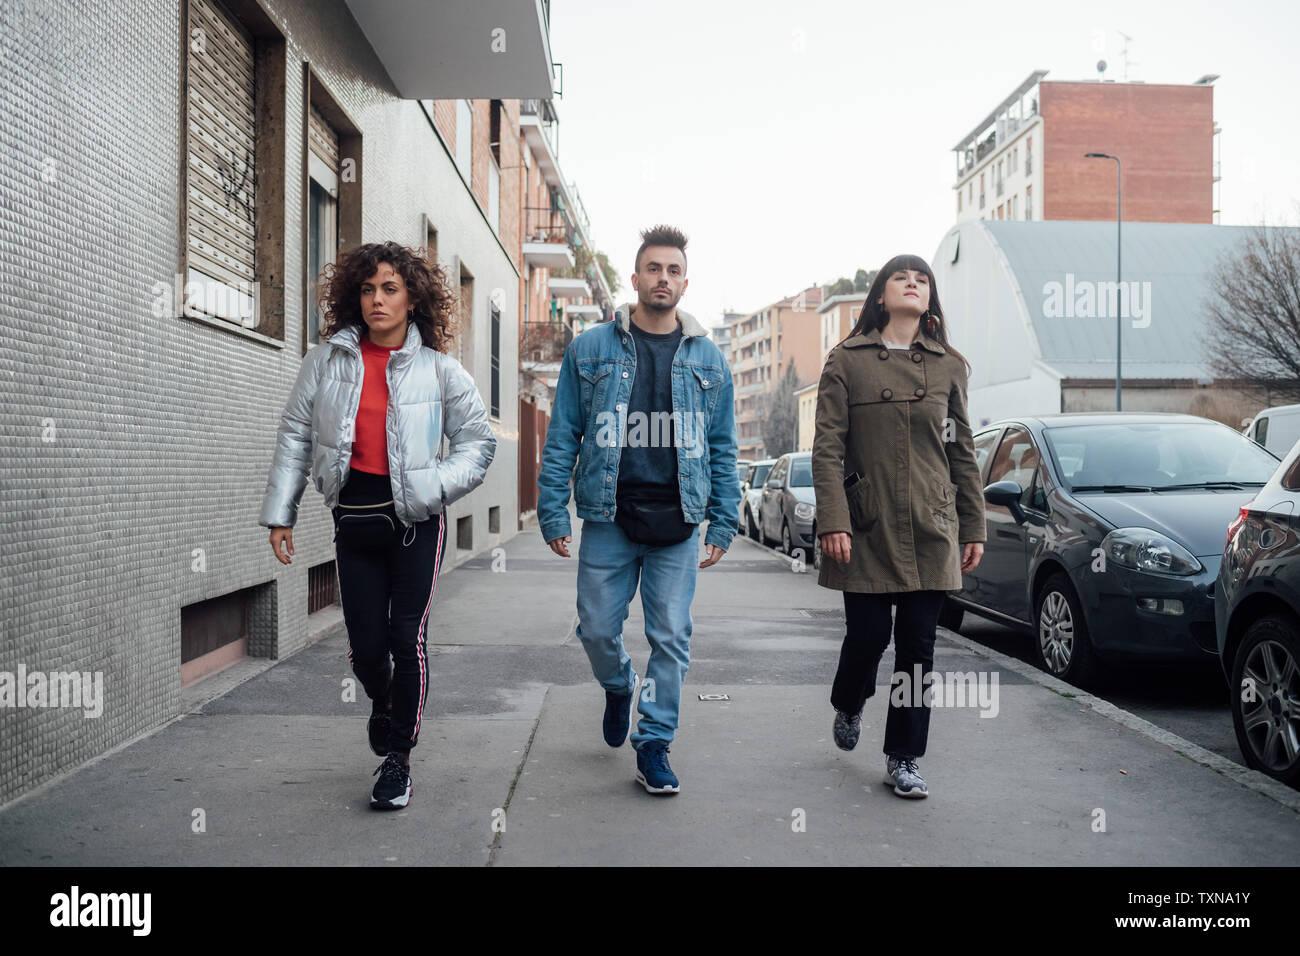 Freunde Theaterspielen Laufsteg auf Bürgersteig, Milano, Lombardei, Italien Stockbild